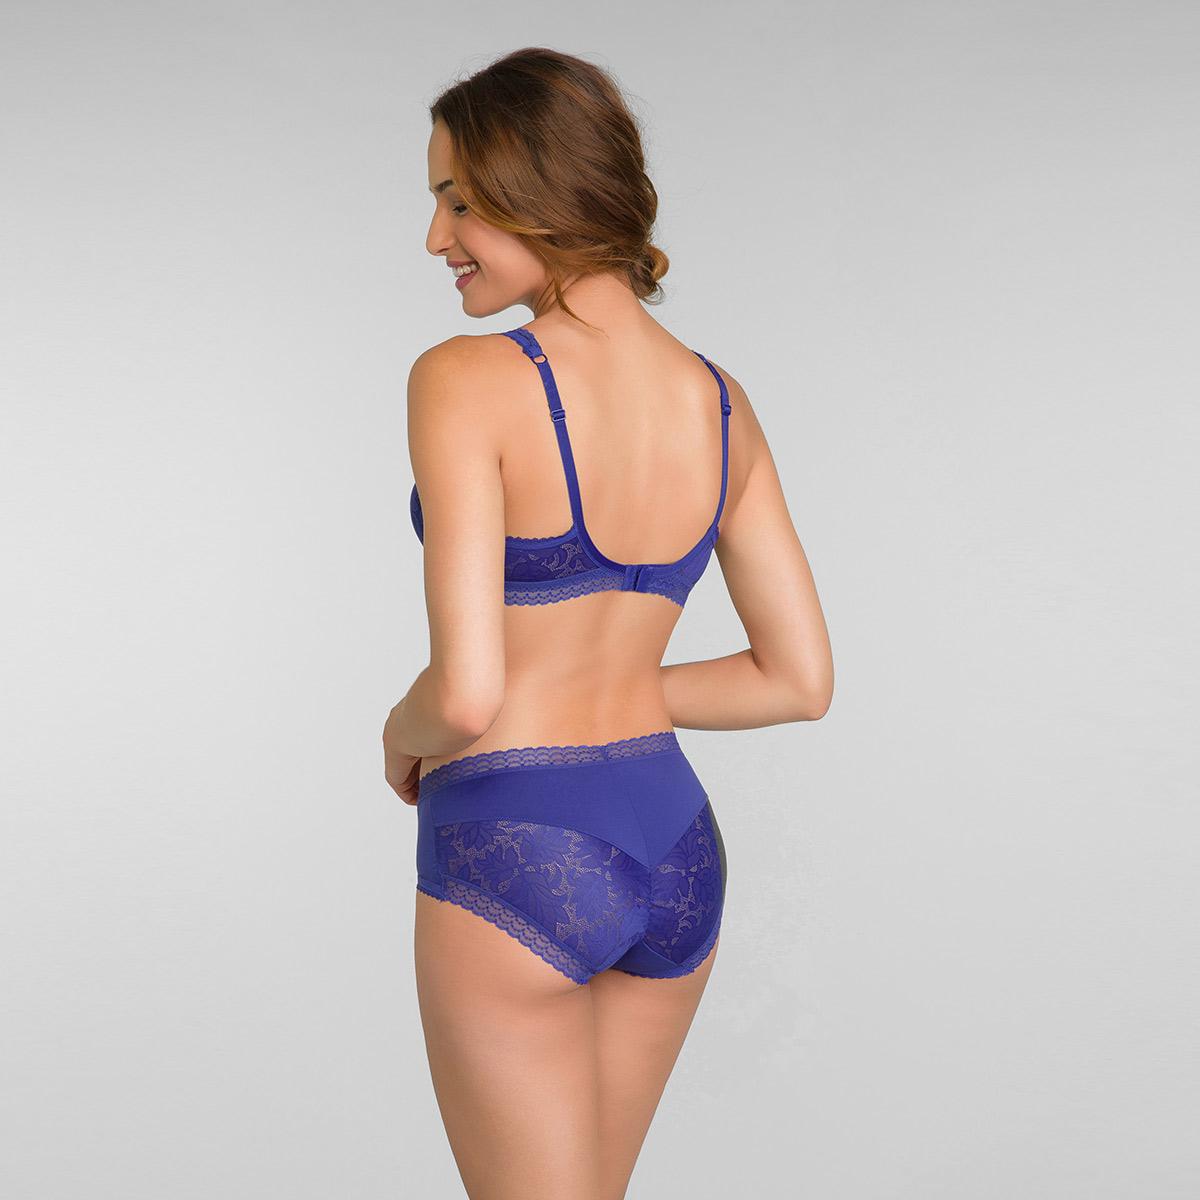 Culotte midi invisible bleu intense Invisible Elegance, , PLAYTEX